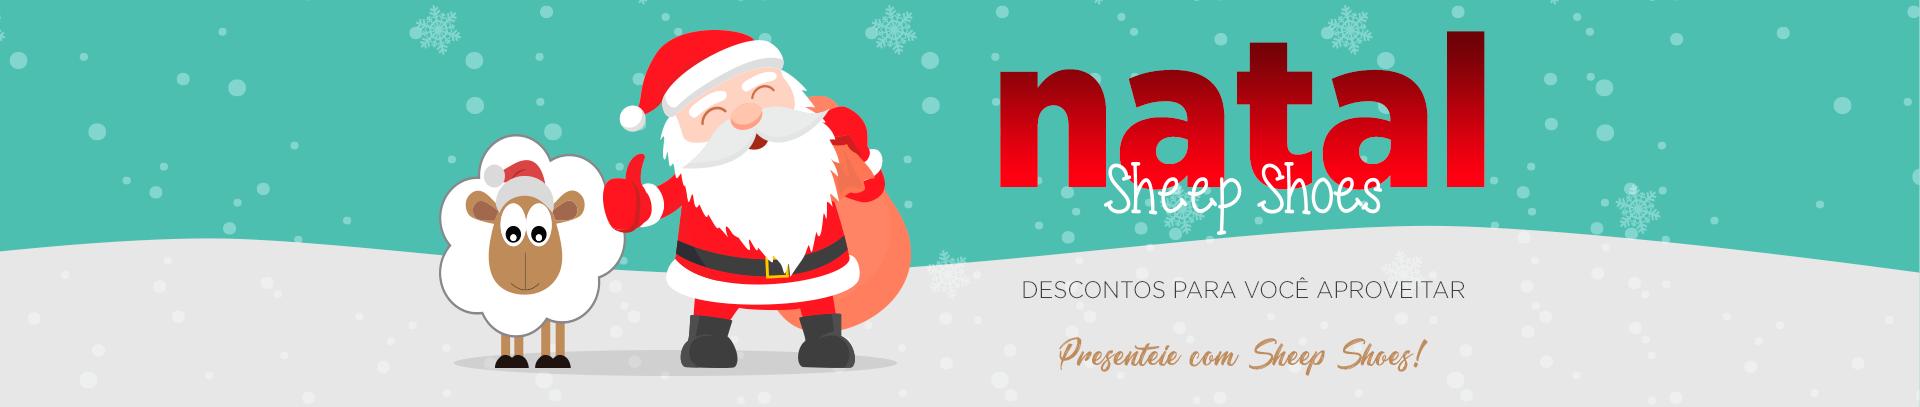 Campanha Tdzain: Natal